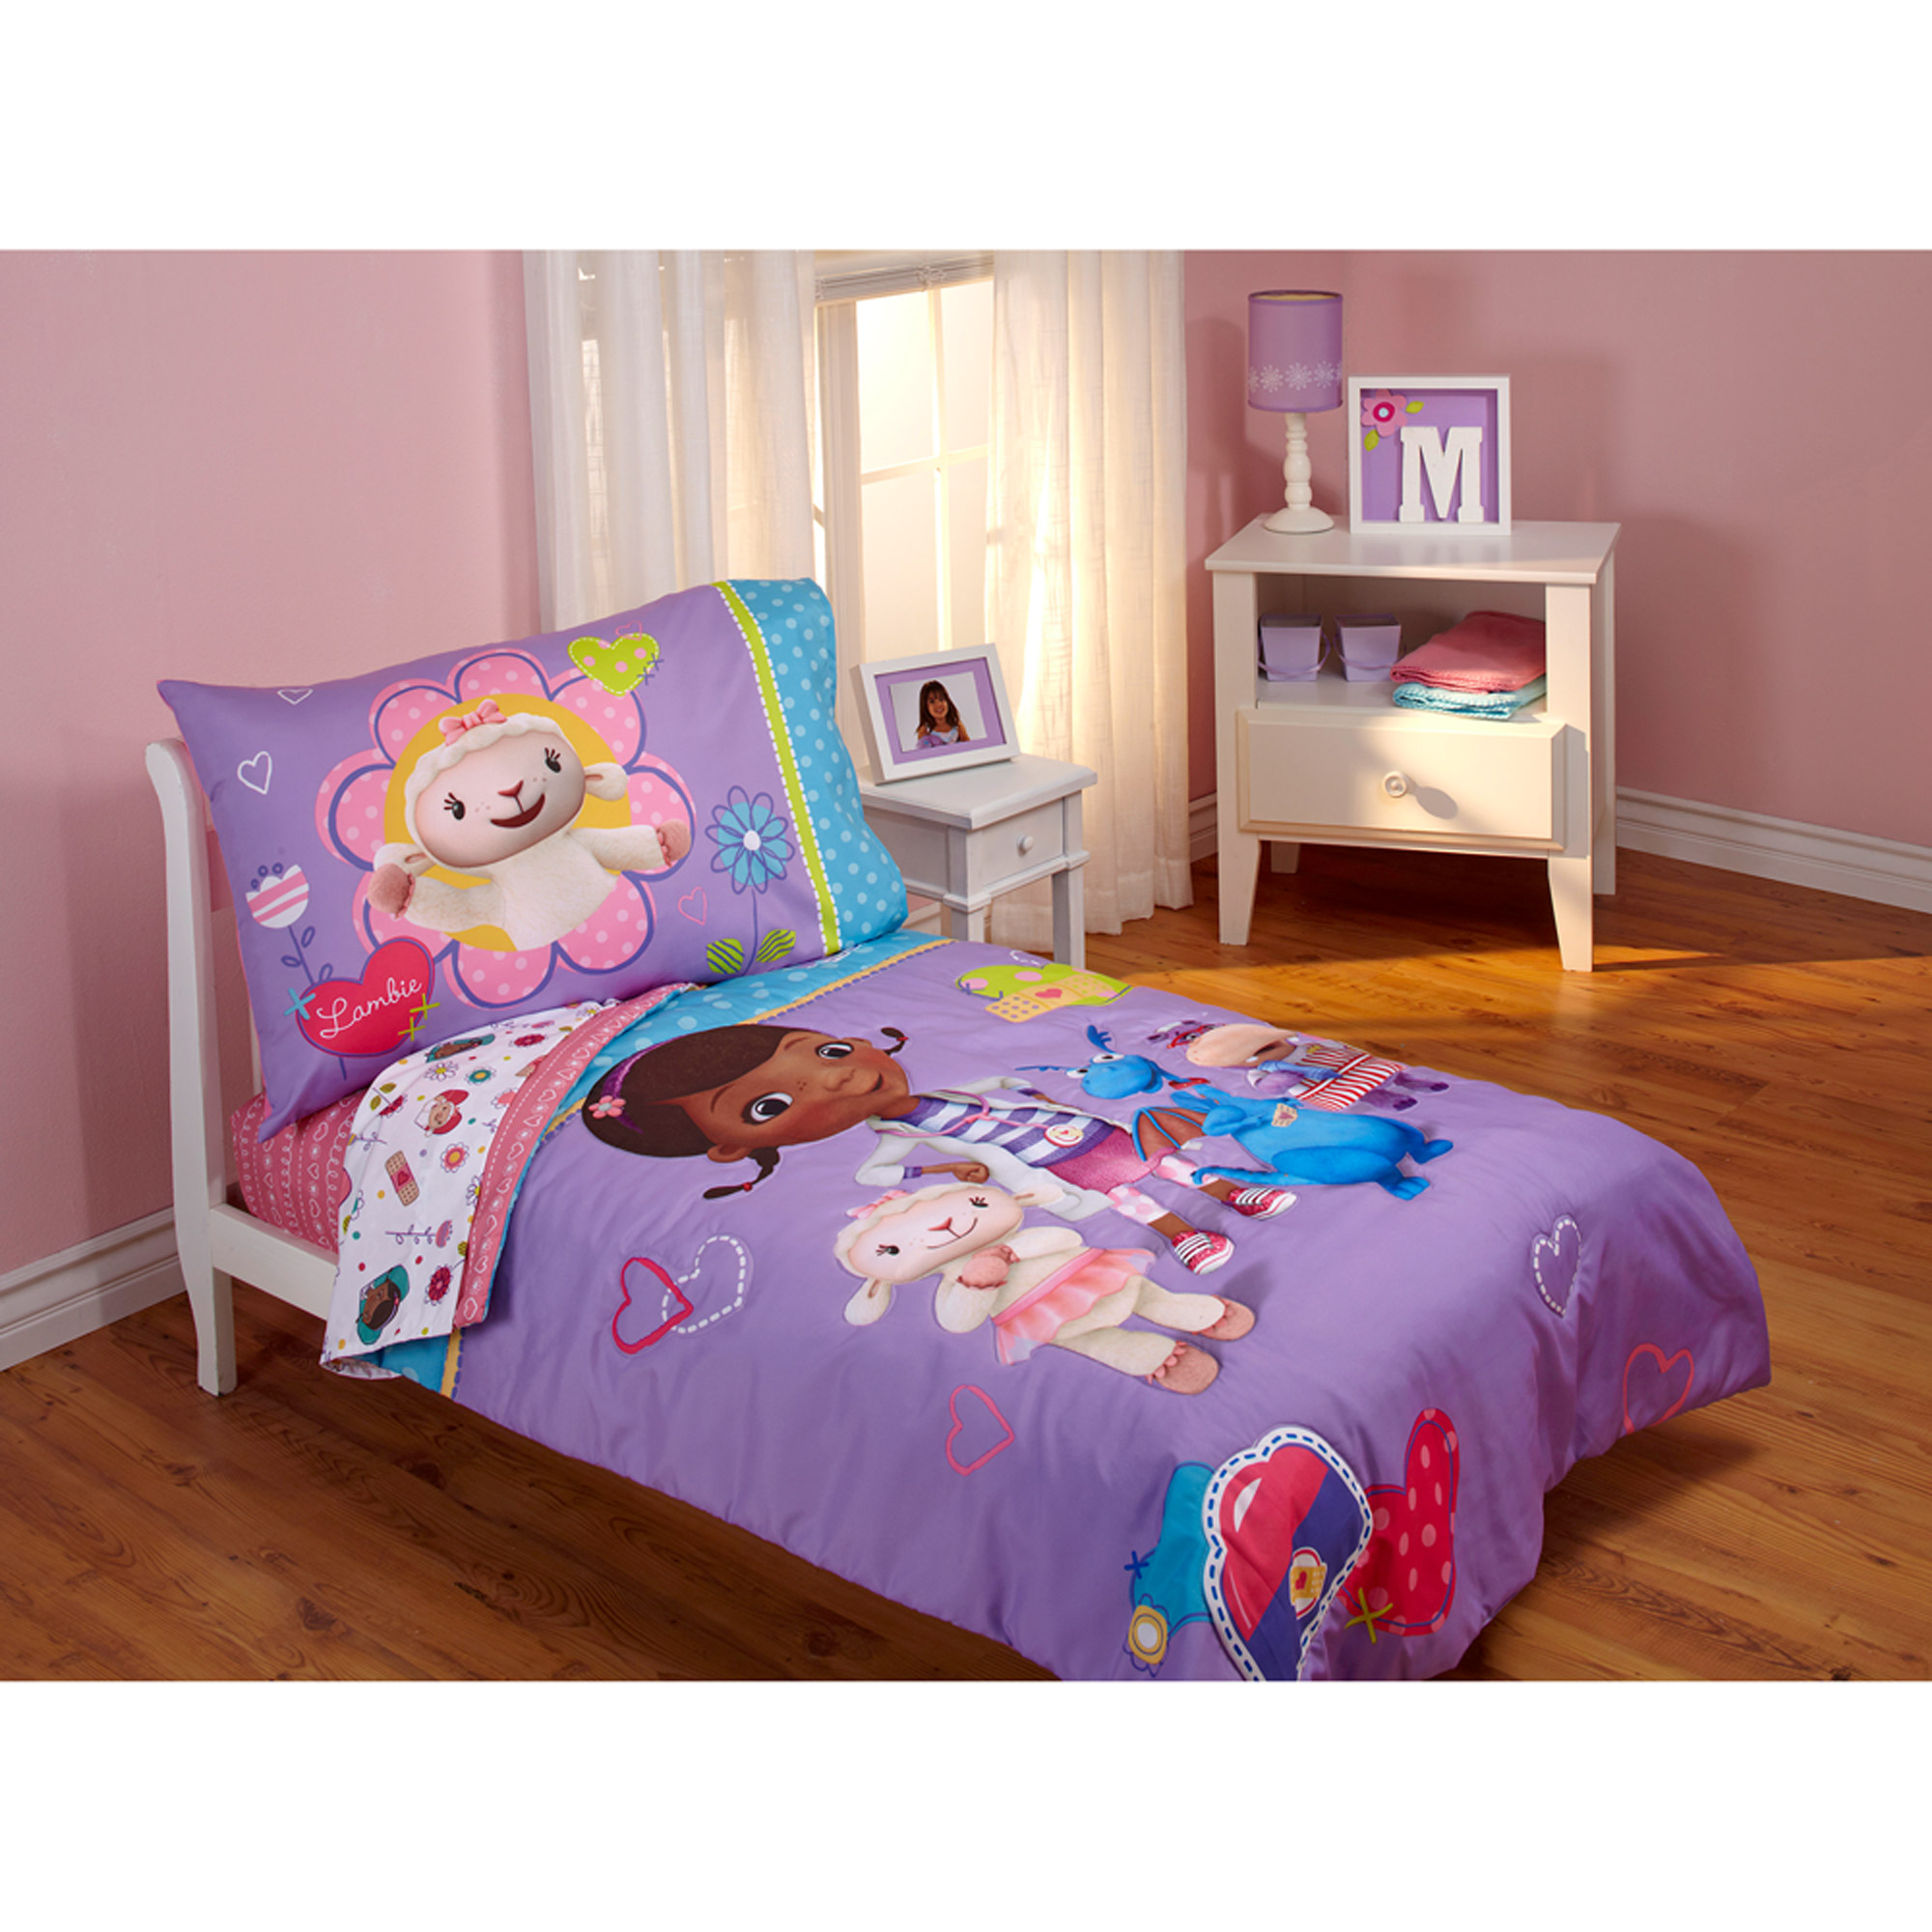 toddler bedding sets disney doc mcstuffins good as new 4-piece toddler bedding set JJJMATX